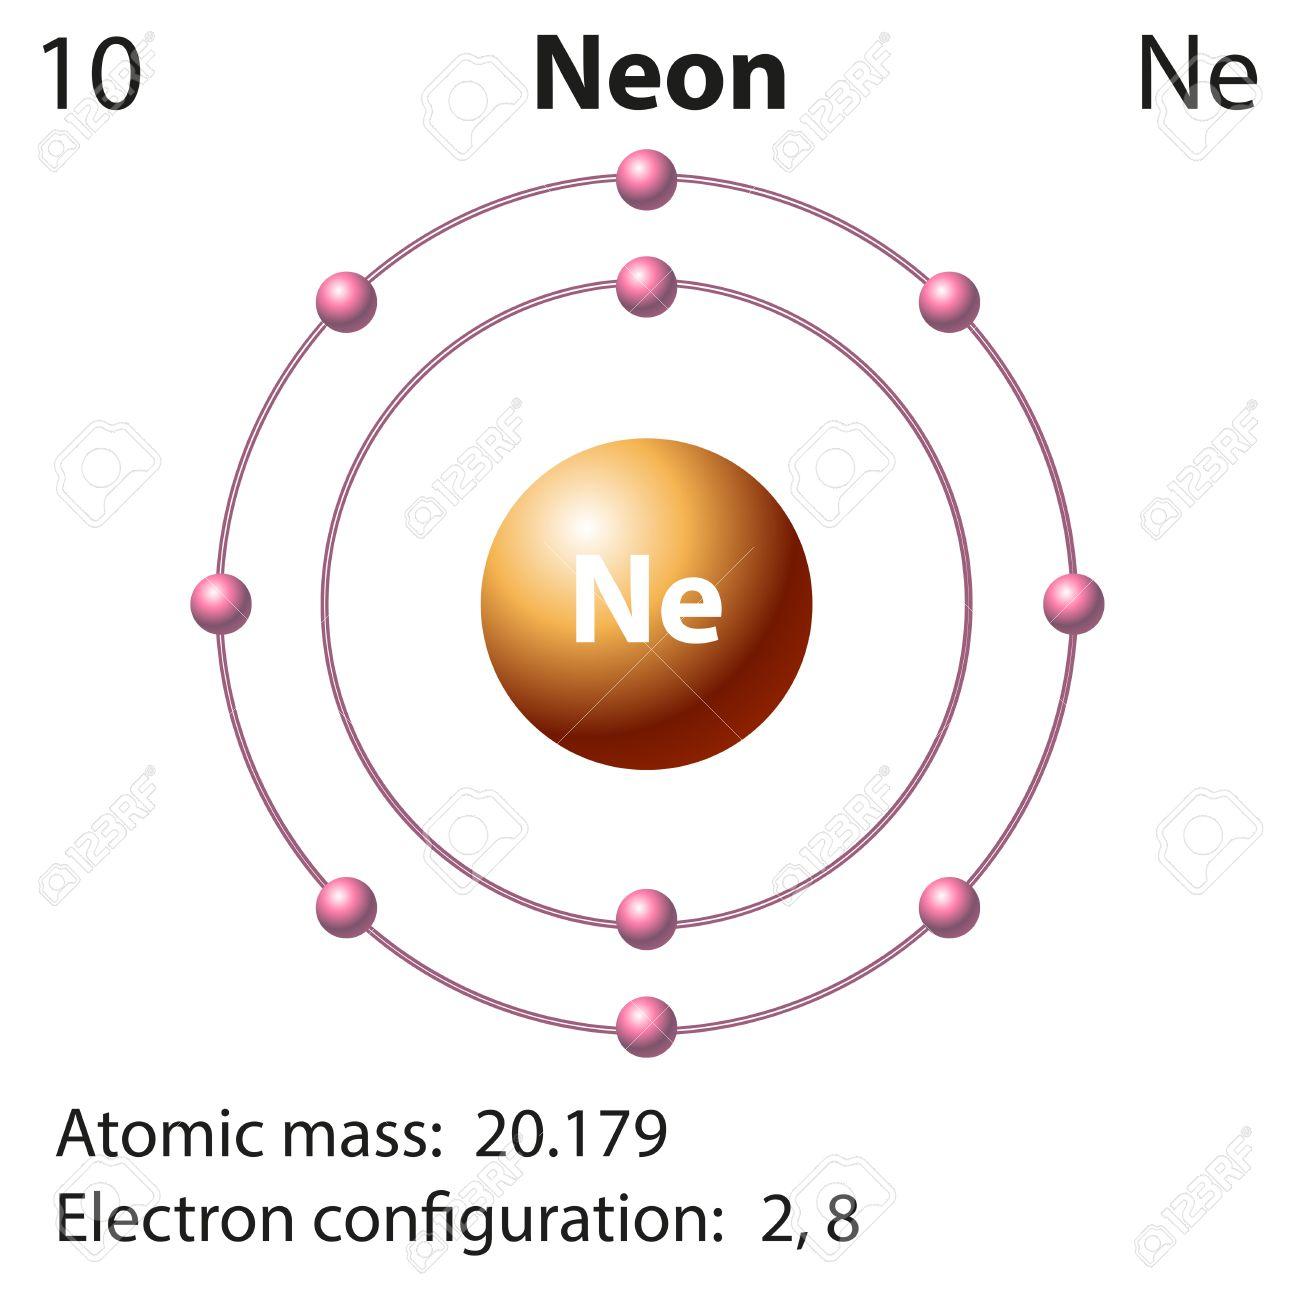 neon atom diagram sheep brain superior view representation of the element illustration royalty free stock vector 44786612